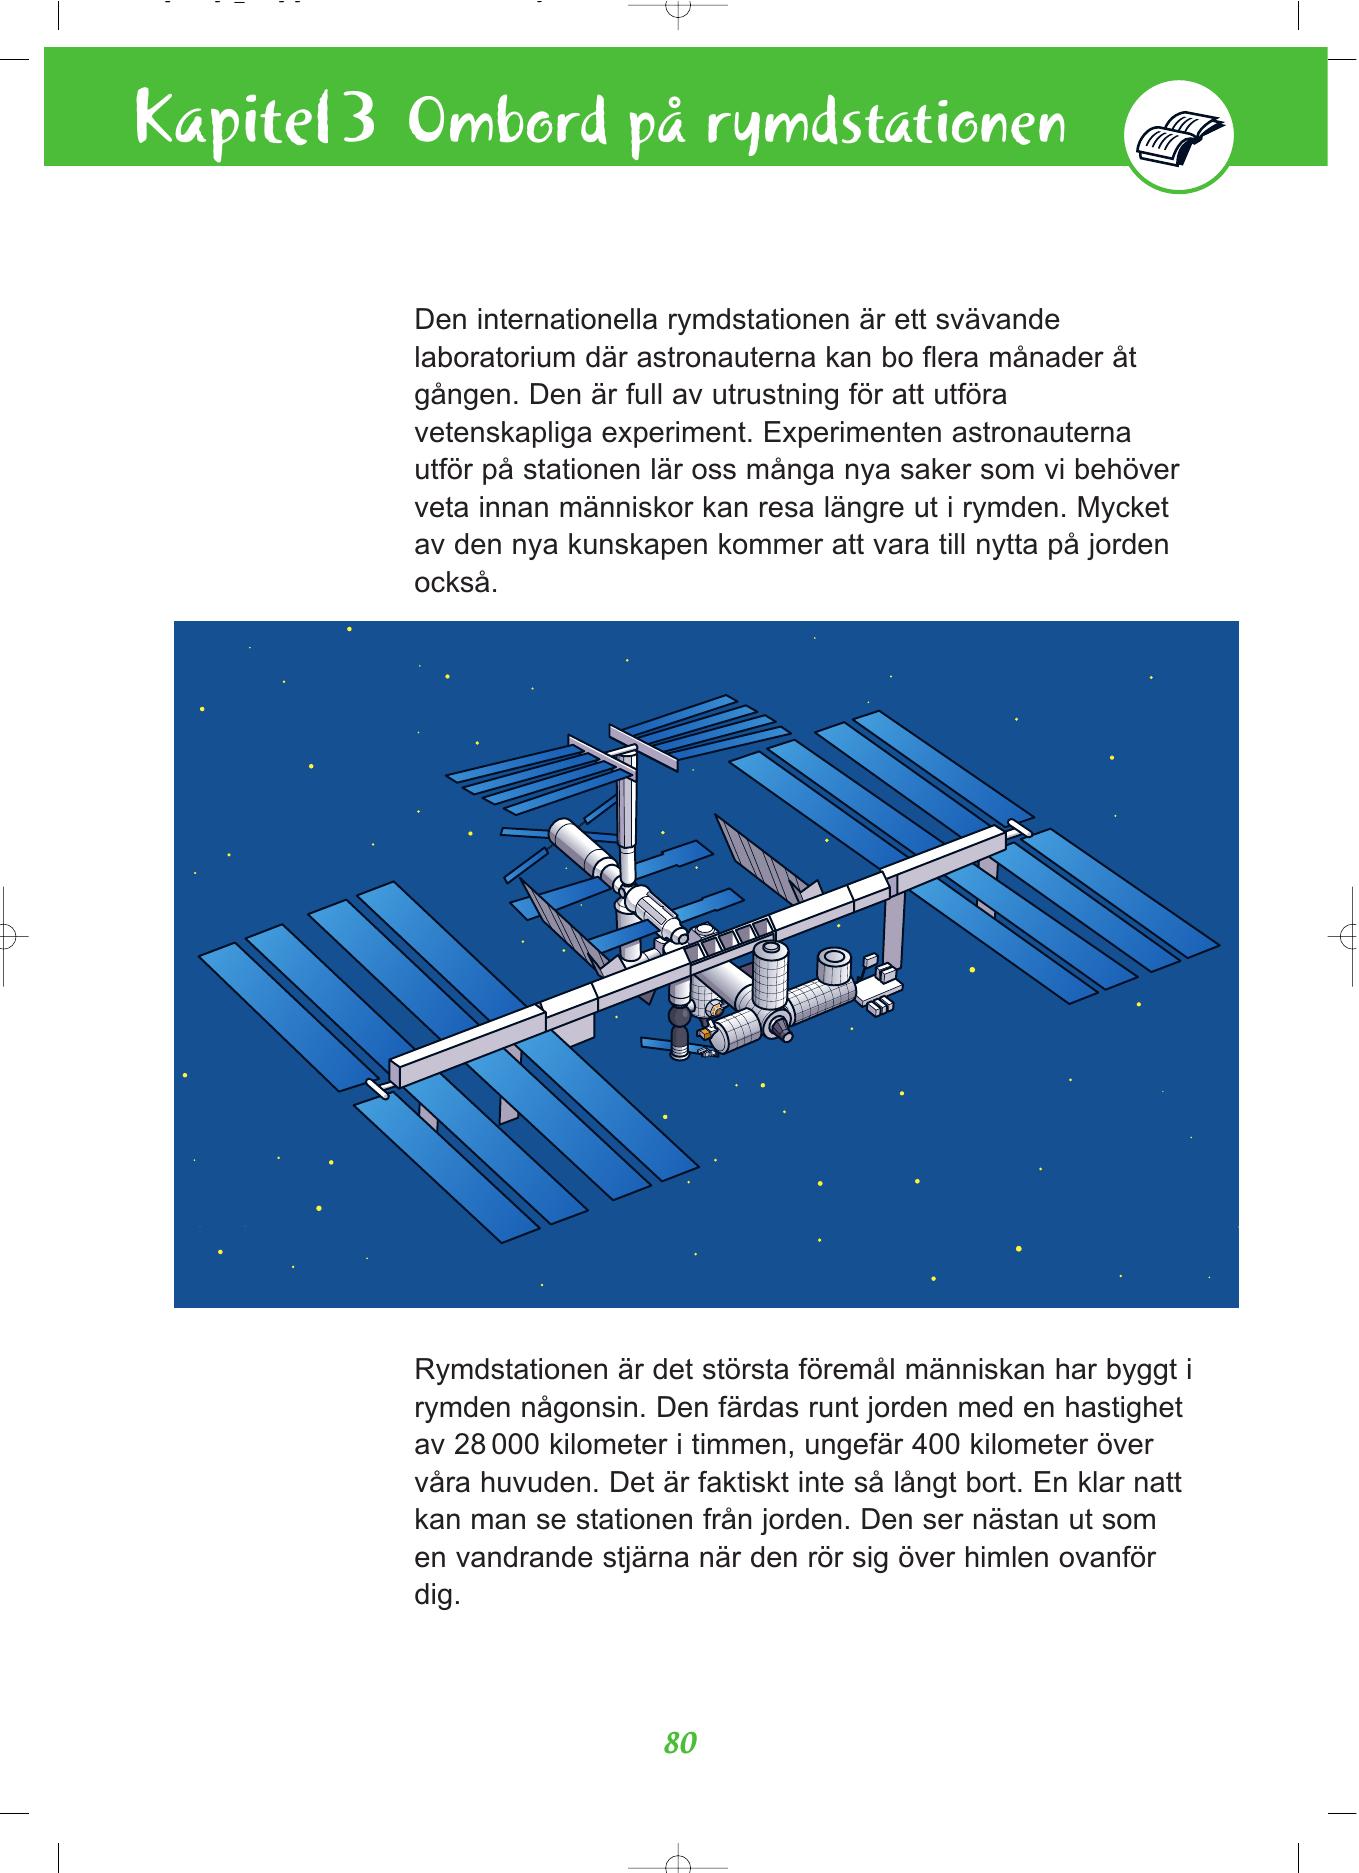 Nya ryska rymdlabb 3